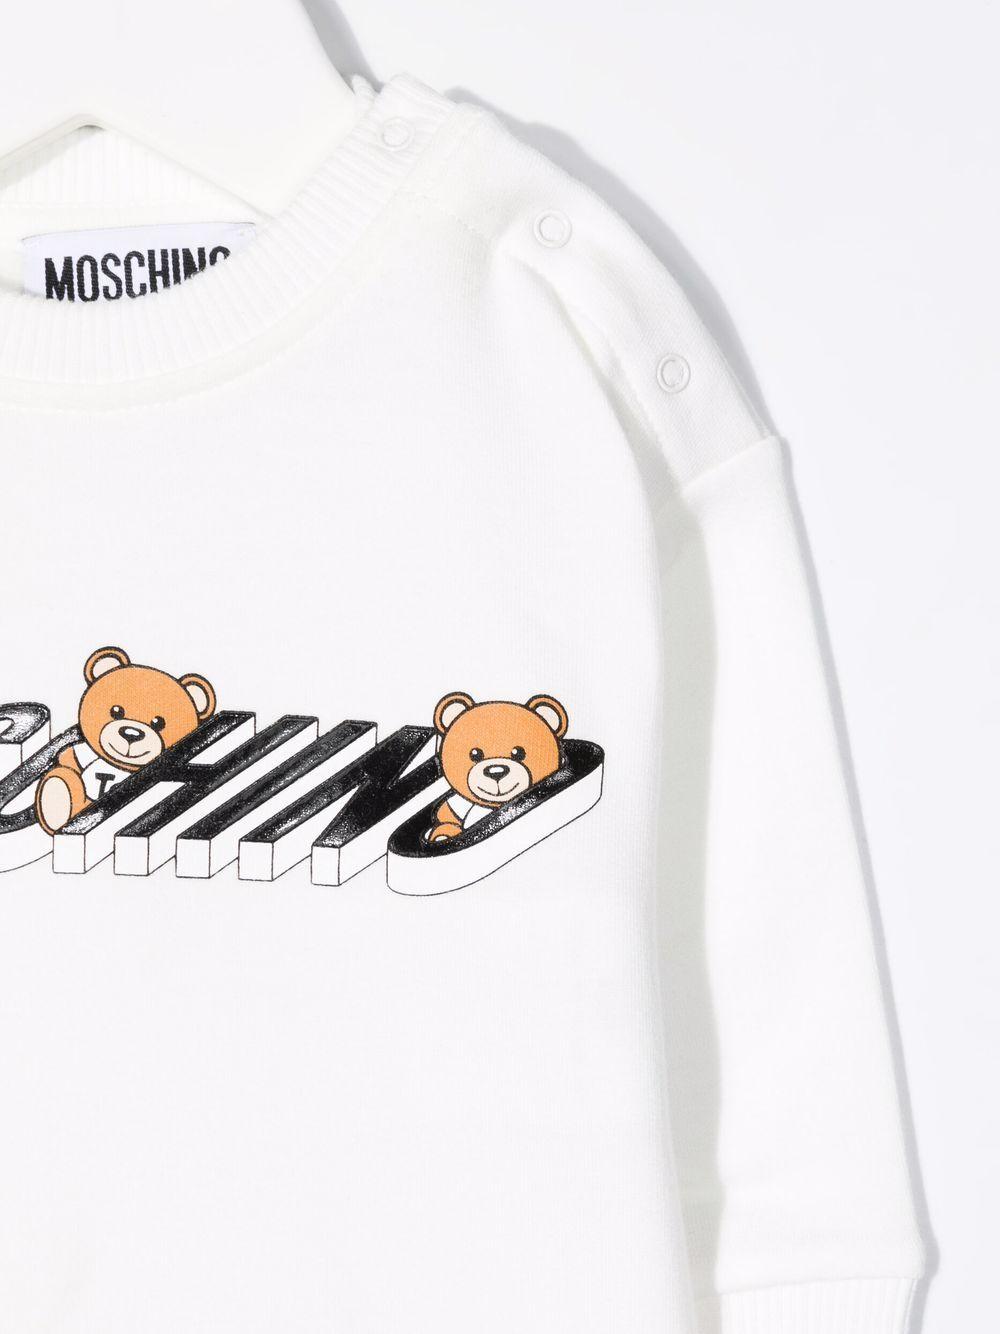 moschino felpa con stampa orsetti MOSCHINO BABY | Felpa | MUF03NLDA1810063